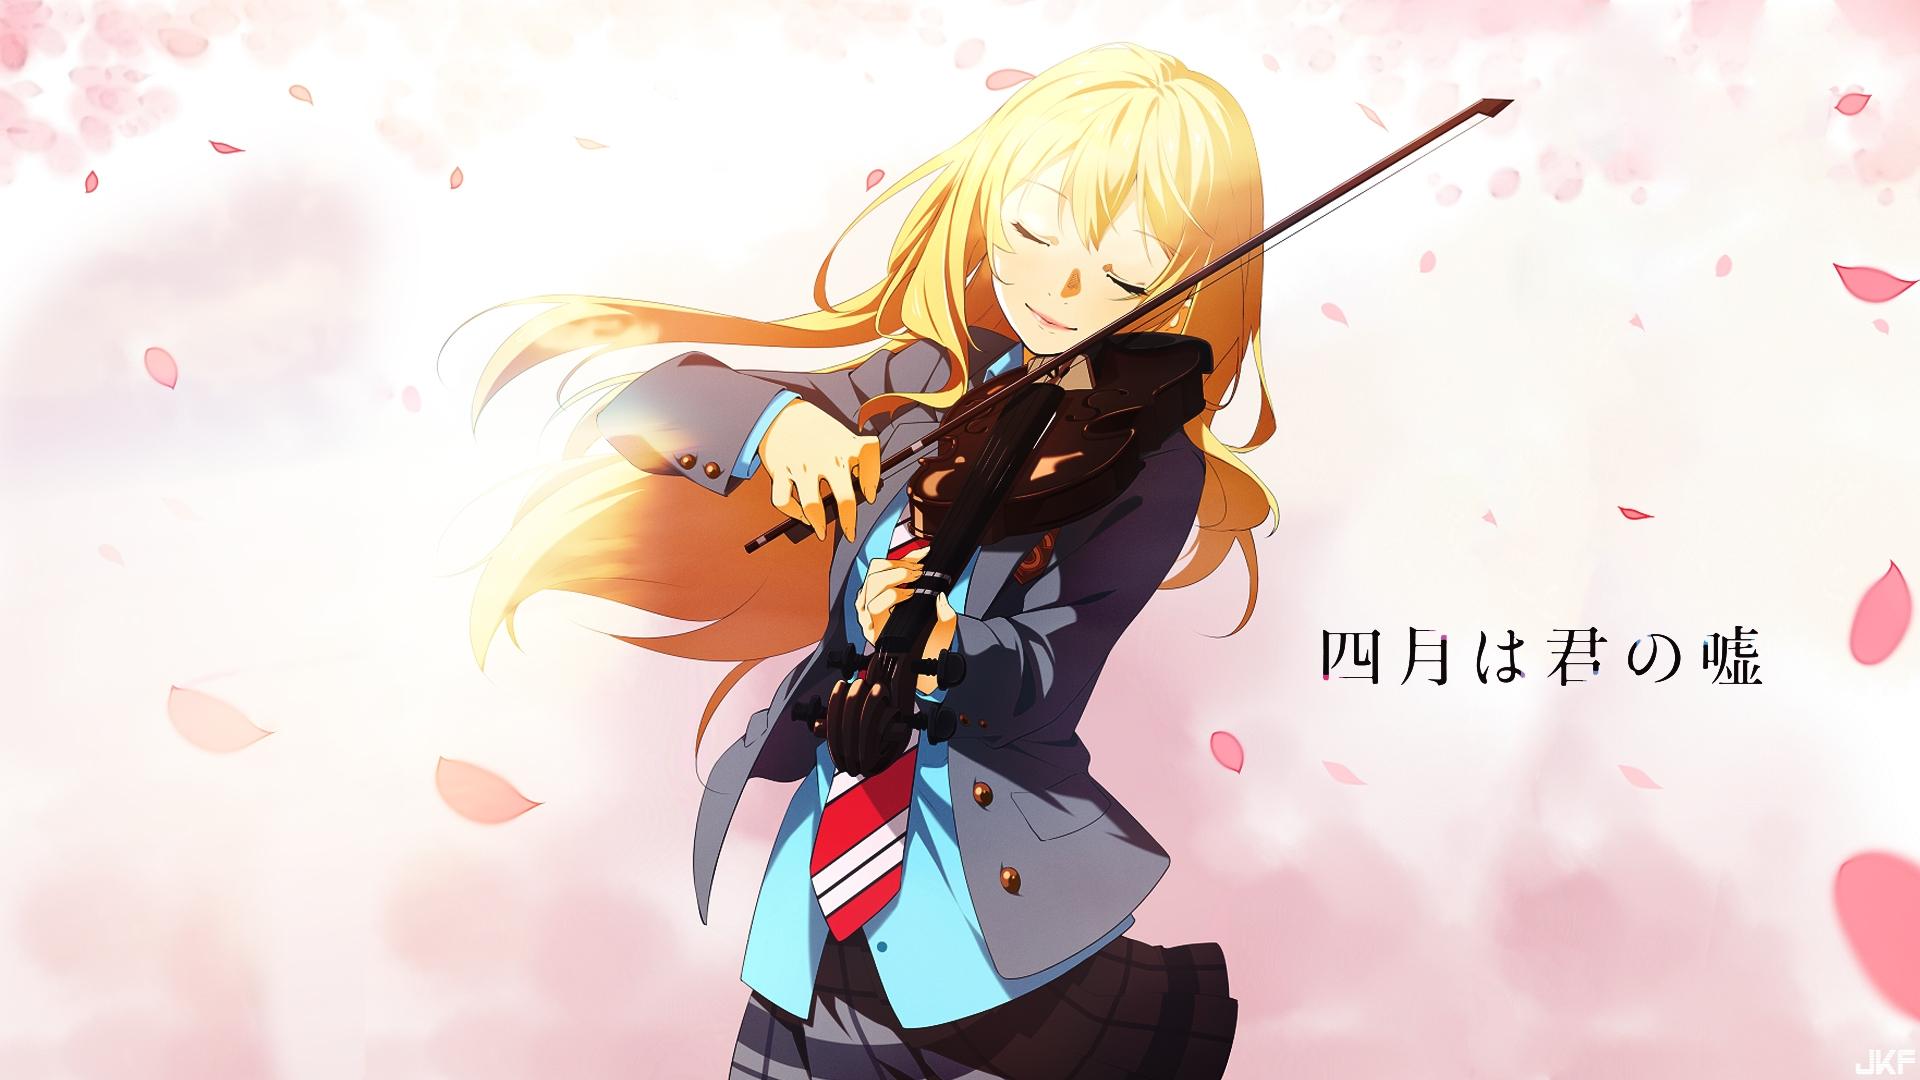 kaori_miyazono_by_dinocojv-d8rmxqe.jpg